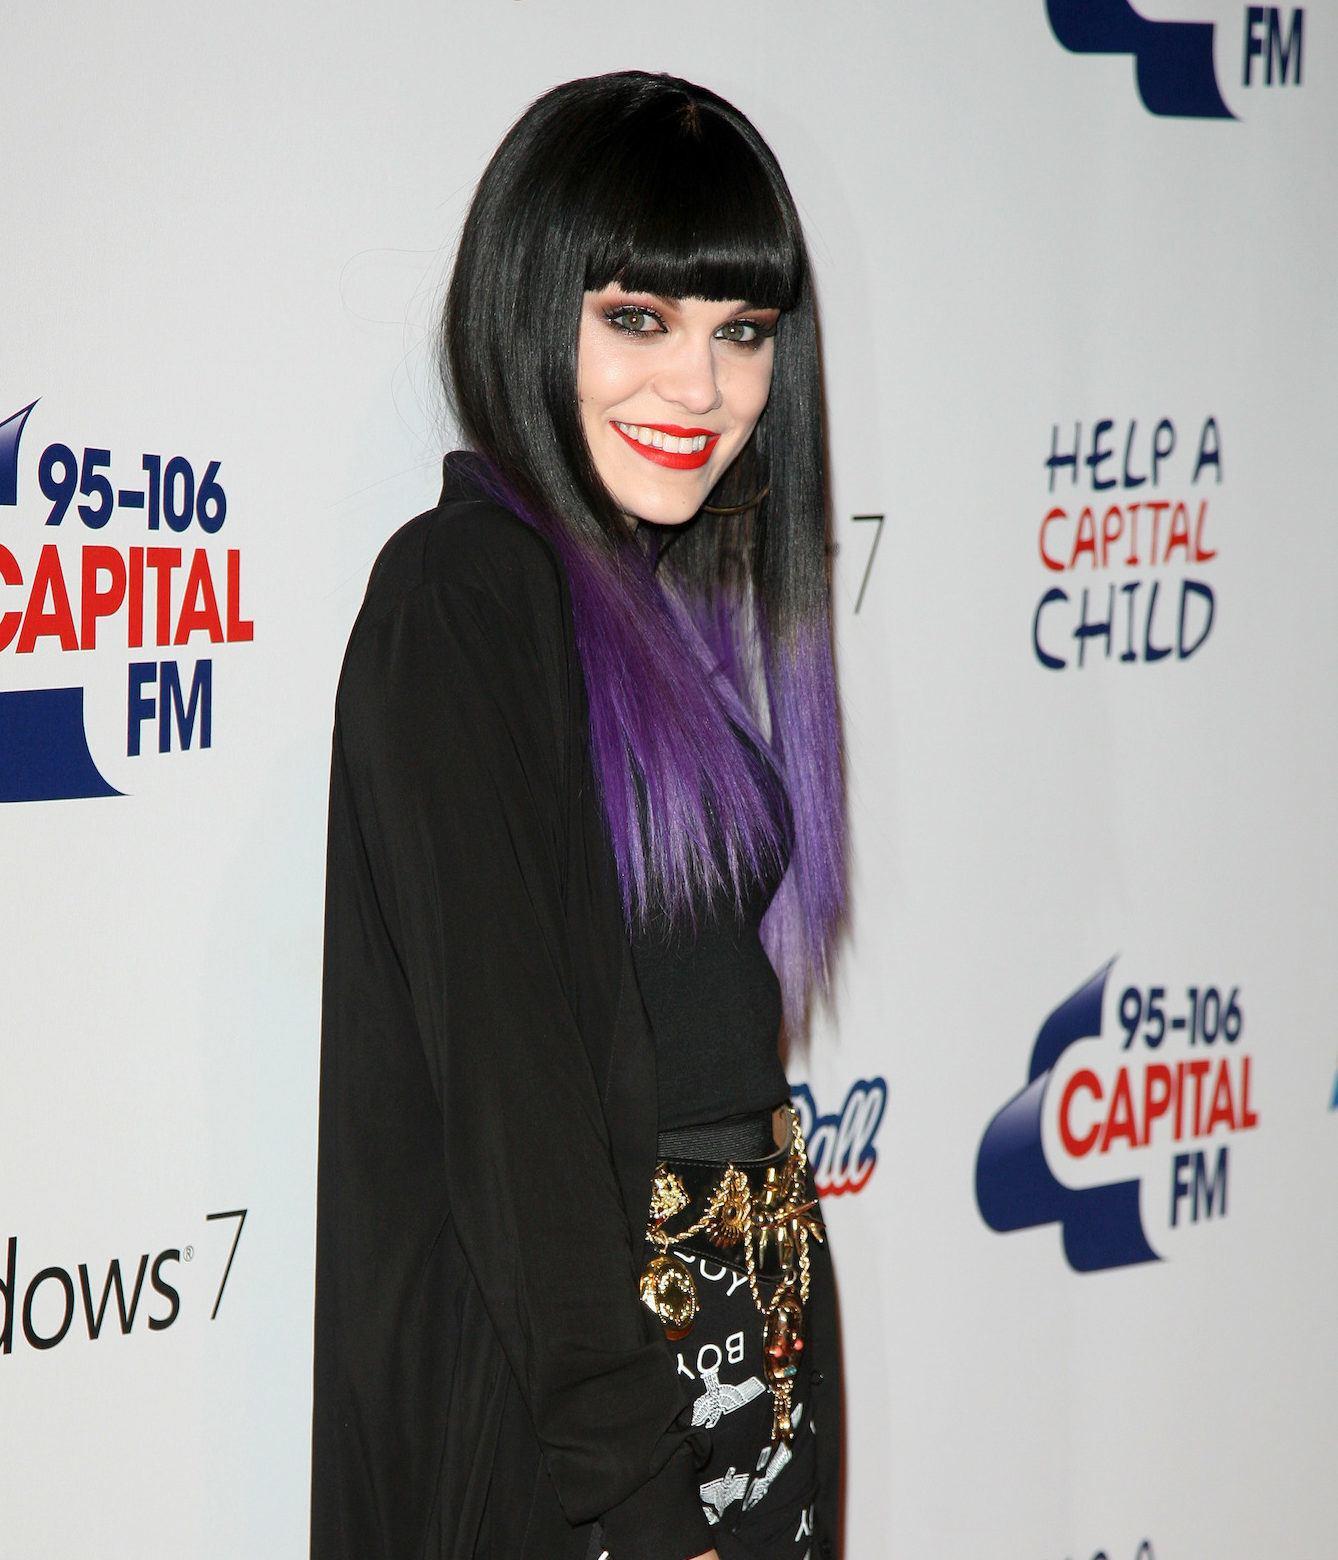 Jessie J dengan rambut dua warna ungu dan hitam.